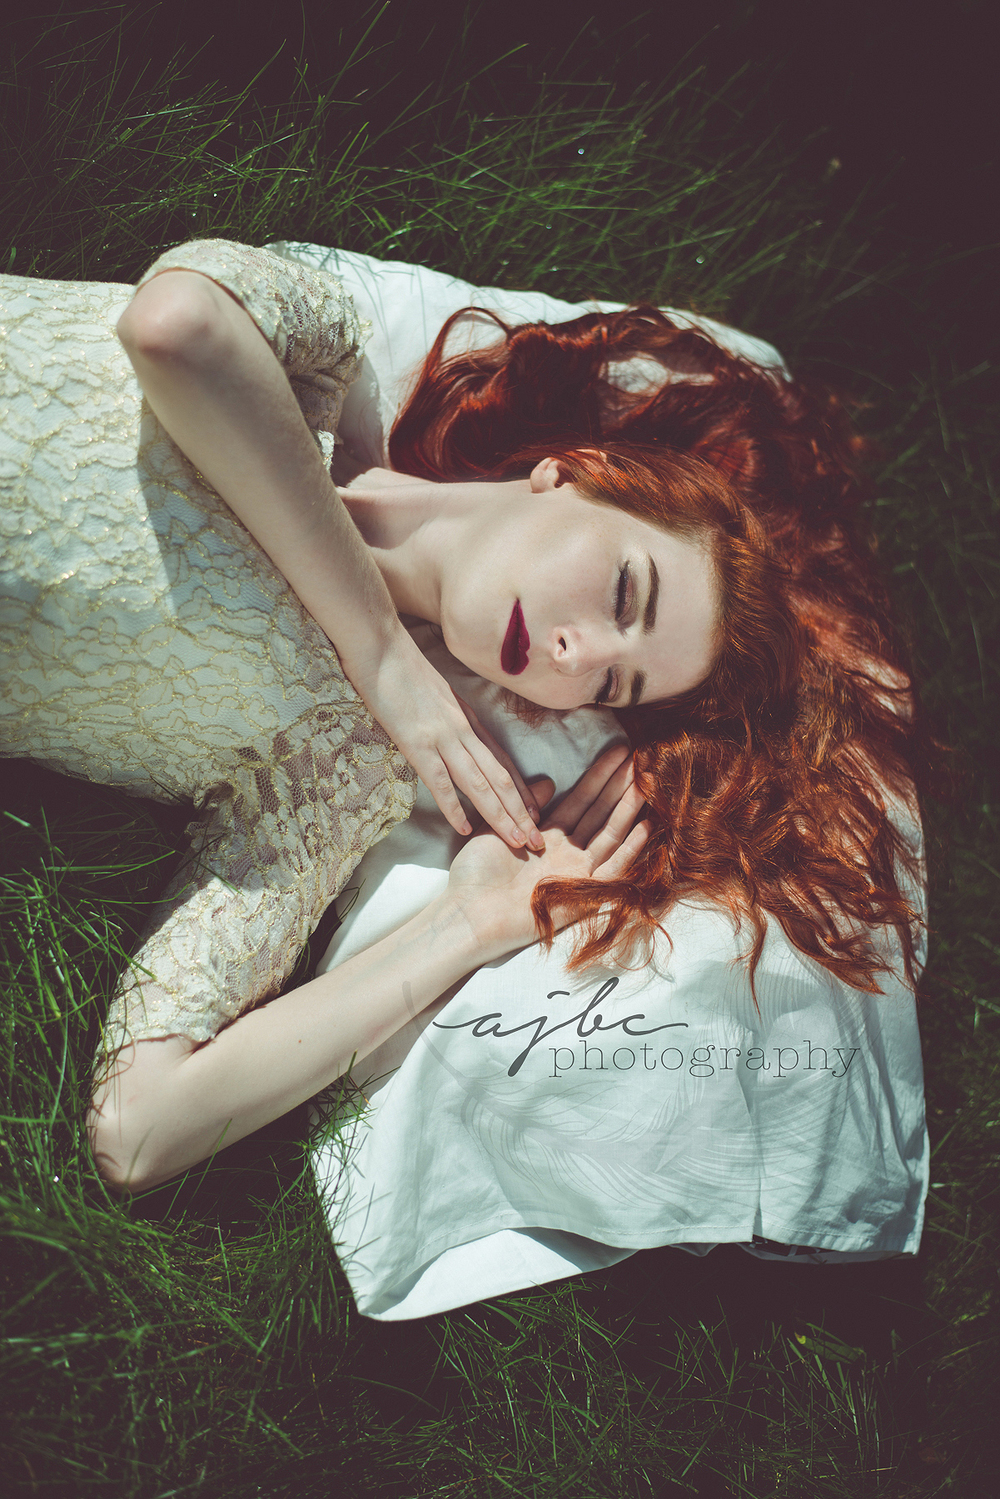 AJBC Photography Fine Art Port Huron Beauty Photographer porcelain skin flawless.jpg